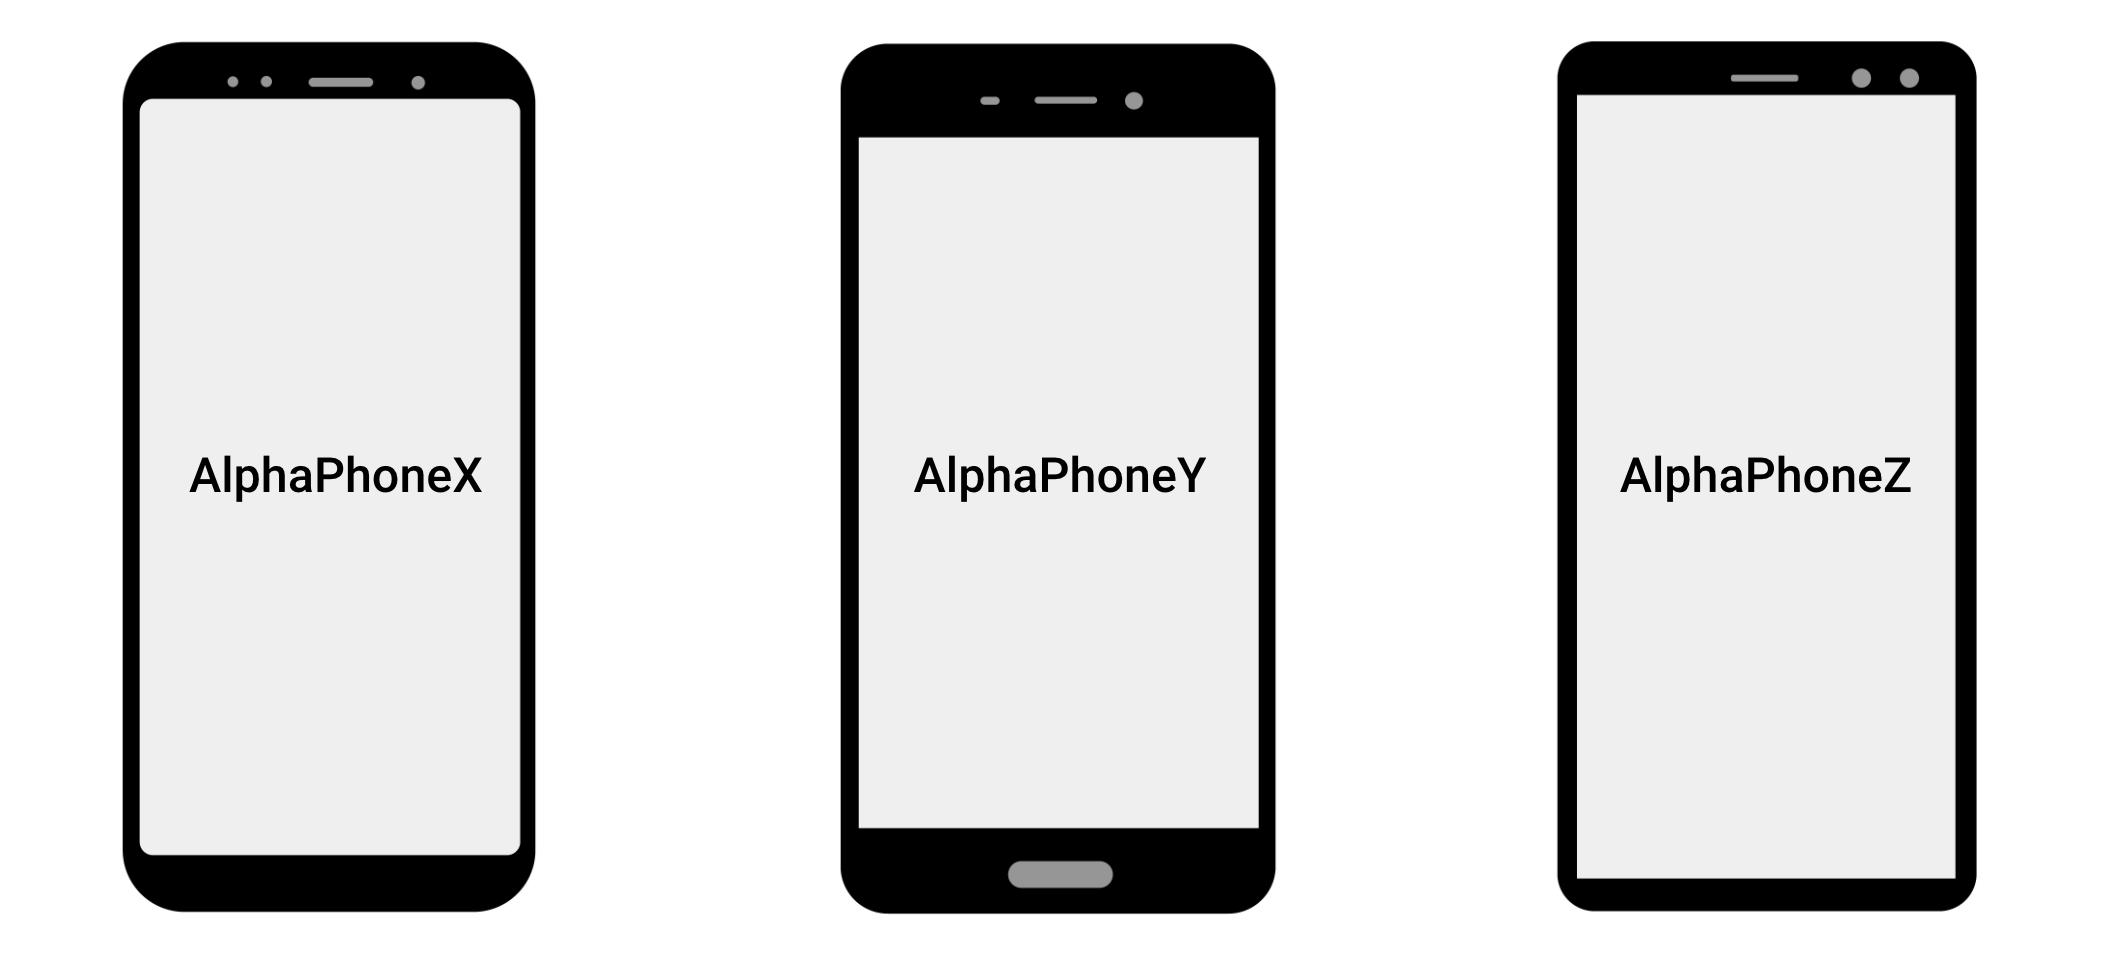 https://assets-lighthouse.alphacamp.co/uploads/image/file/5224/ExportedContentImage_00.png